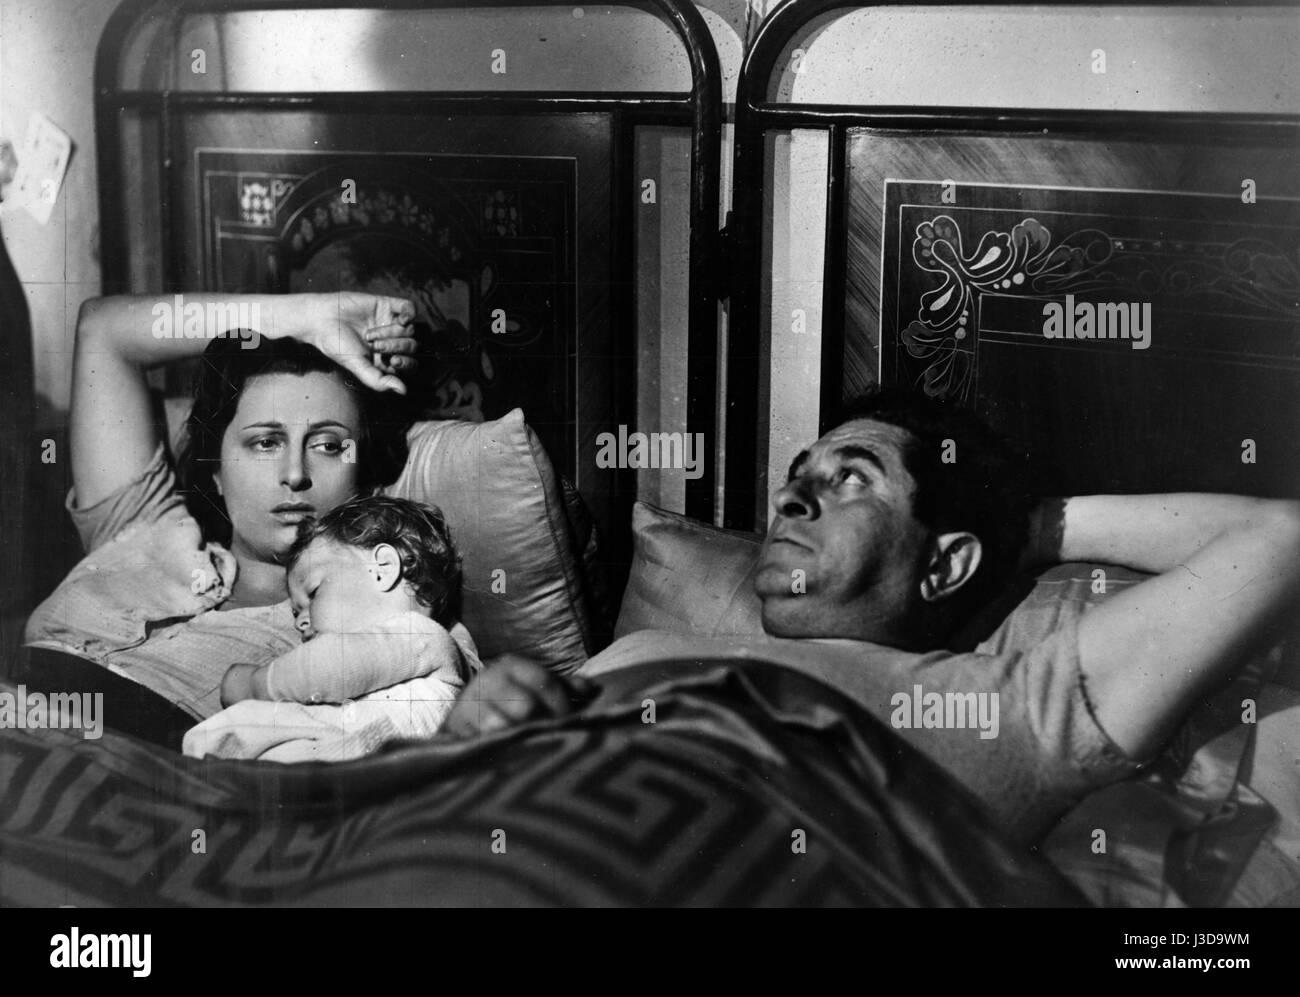 Harland Williams,Aviva Baumann Erotic pics & movies Carol Ann Susi,Nadia Afghan